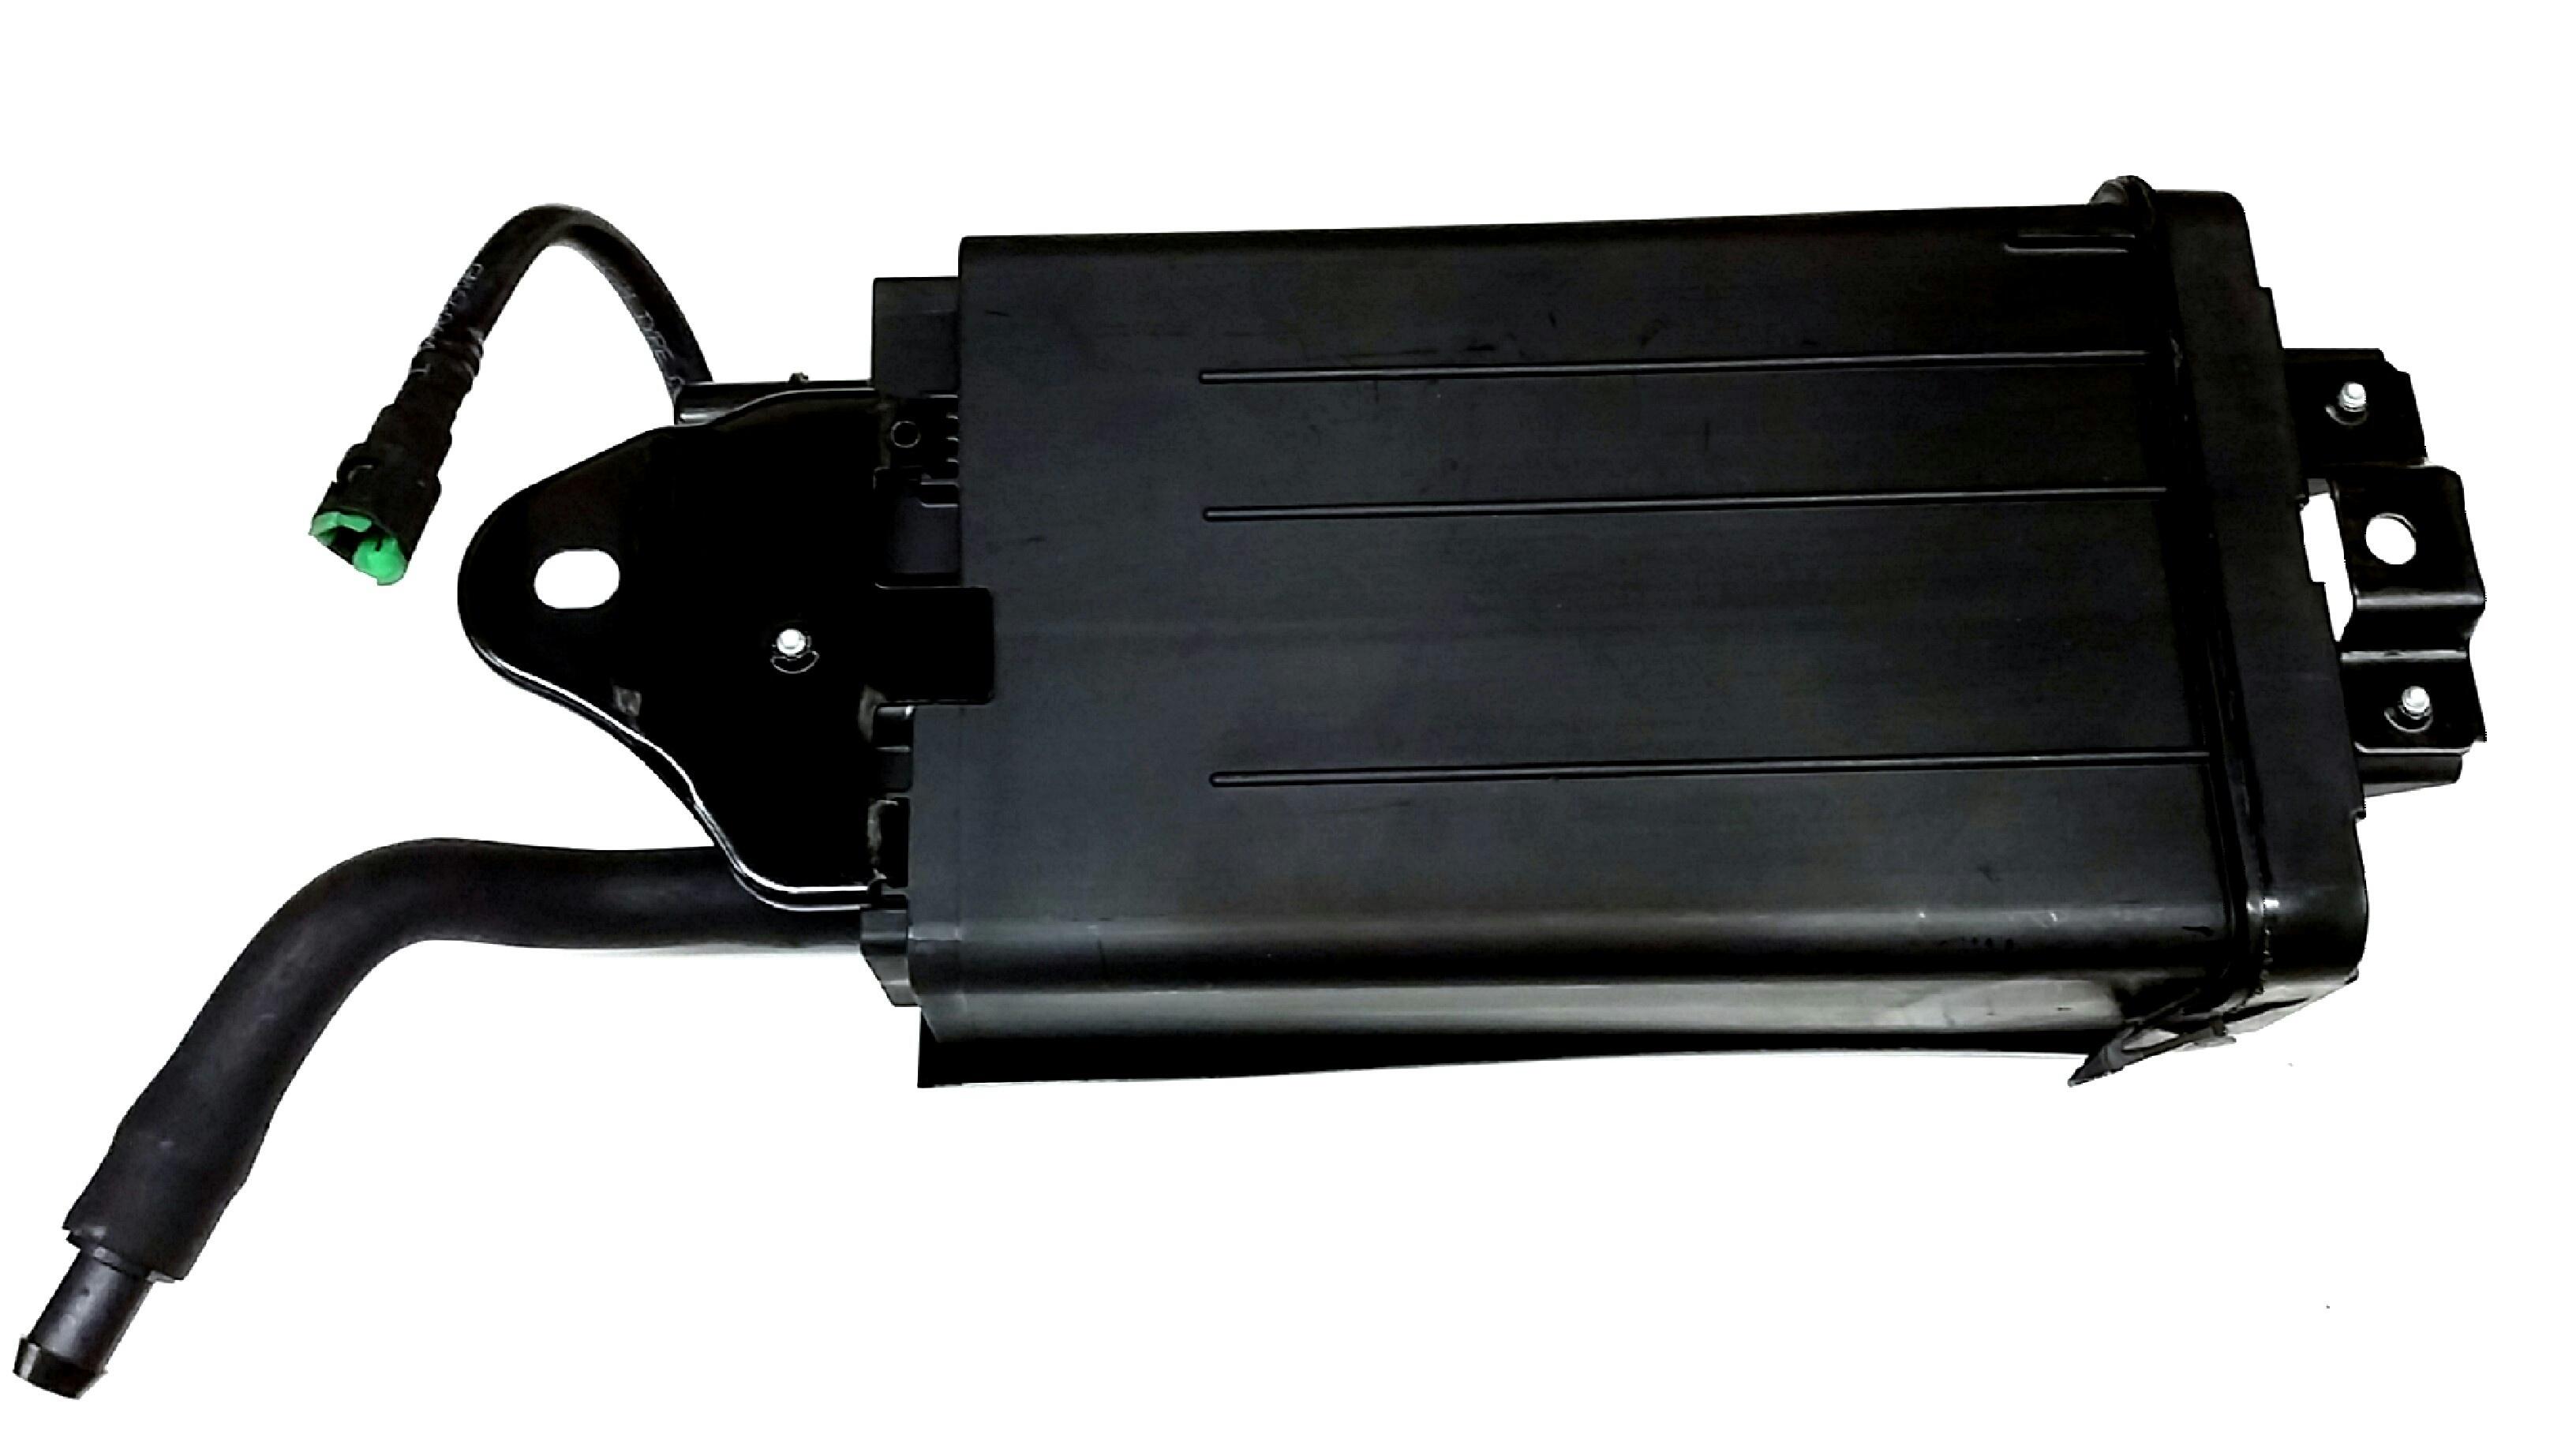 314203k600 hyundai canister assembly jim ellis hyundai. Black Bedroom Furniture Sets. Home Design Ideas